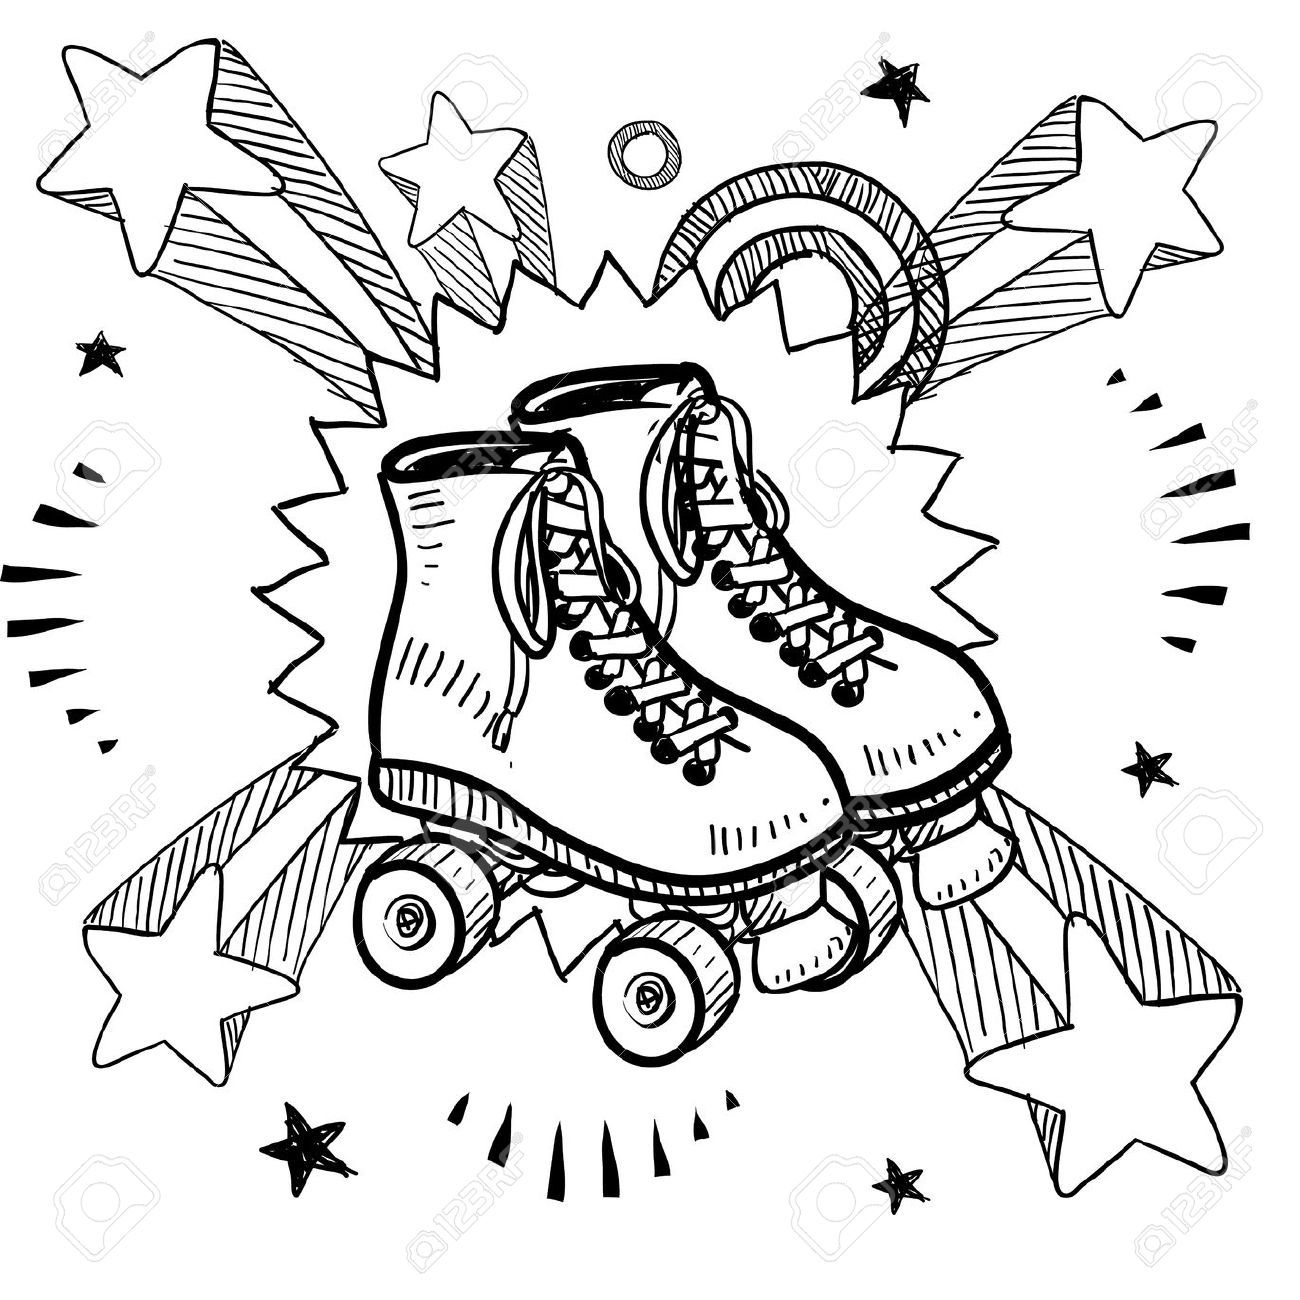 Zebra roller skates - Vector Of Doodle Style Sketch Of Rollerskates On Pop Explosion Background In Or Style In Vector Illustration